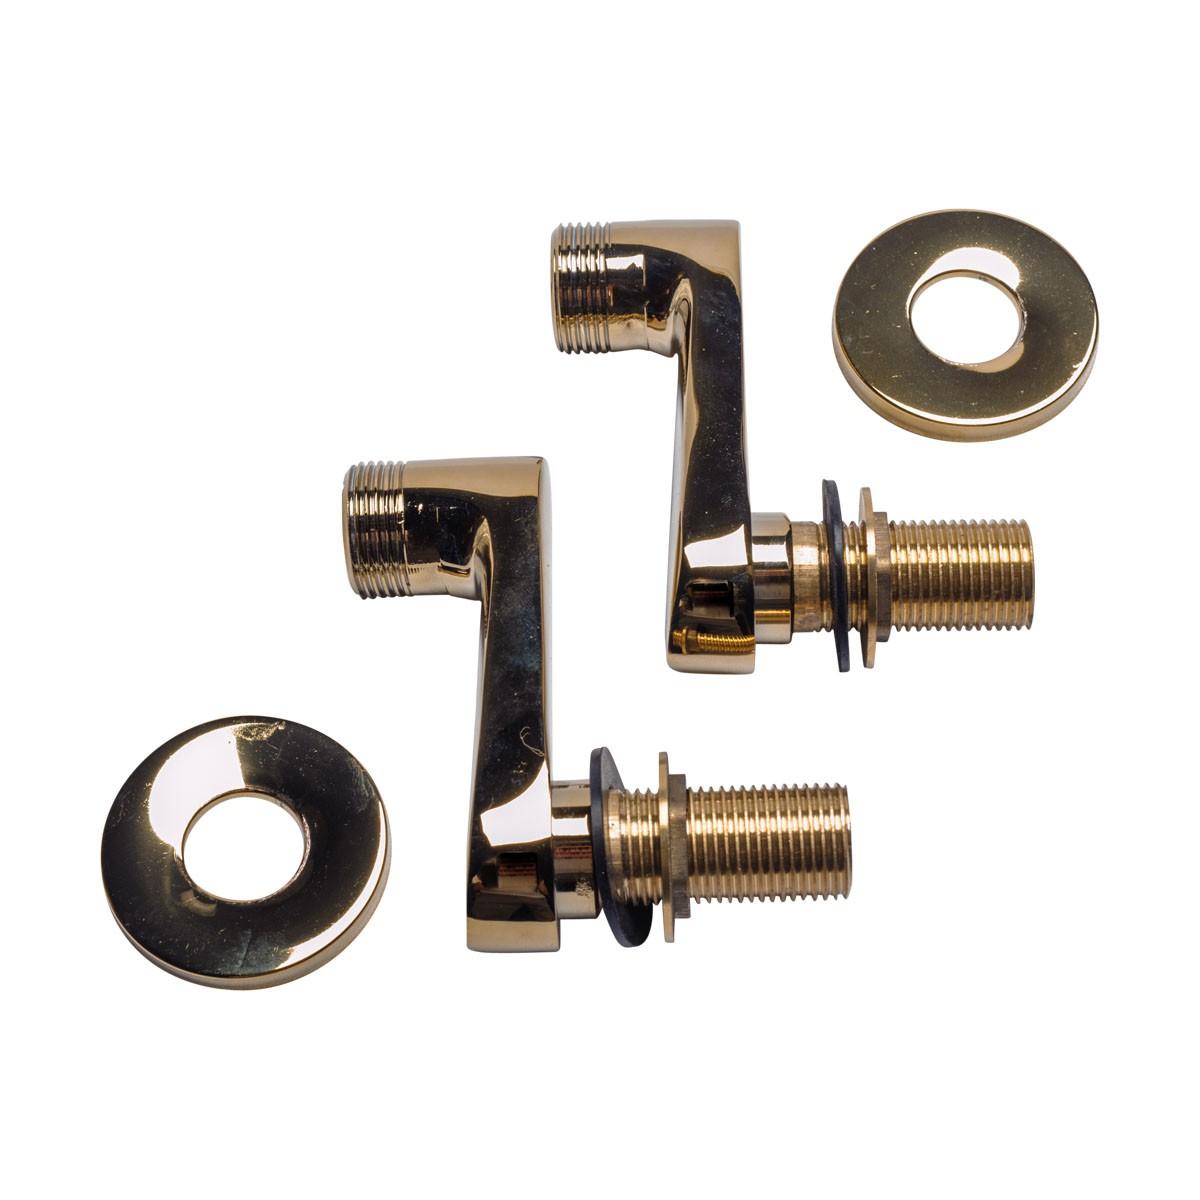 faucet at shop repair pl lowes parts plastic shower posi cartridge plumbing temp for replacement tub com handle moen